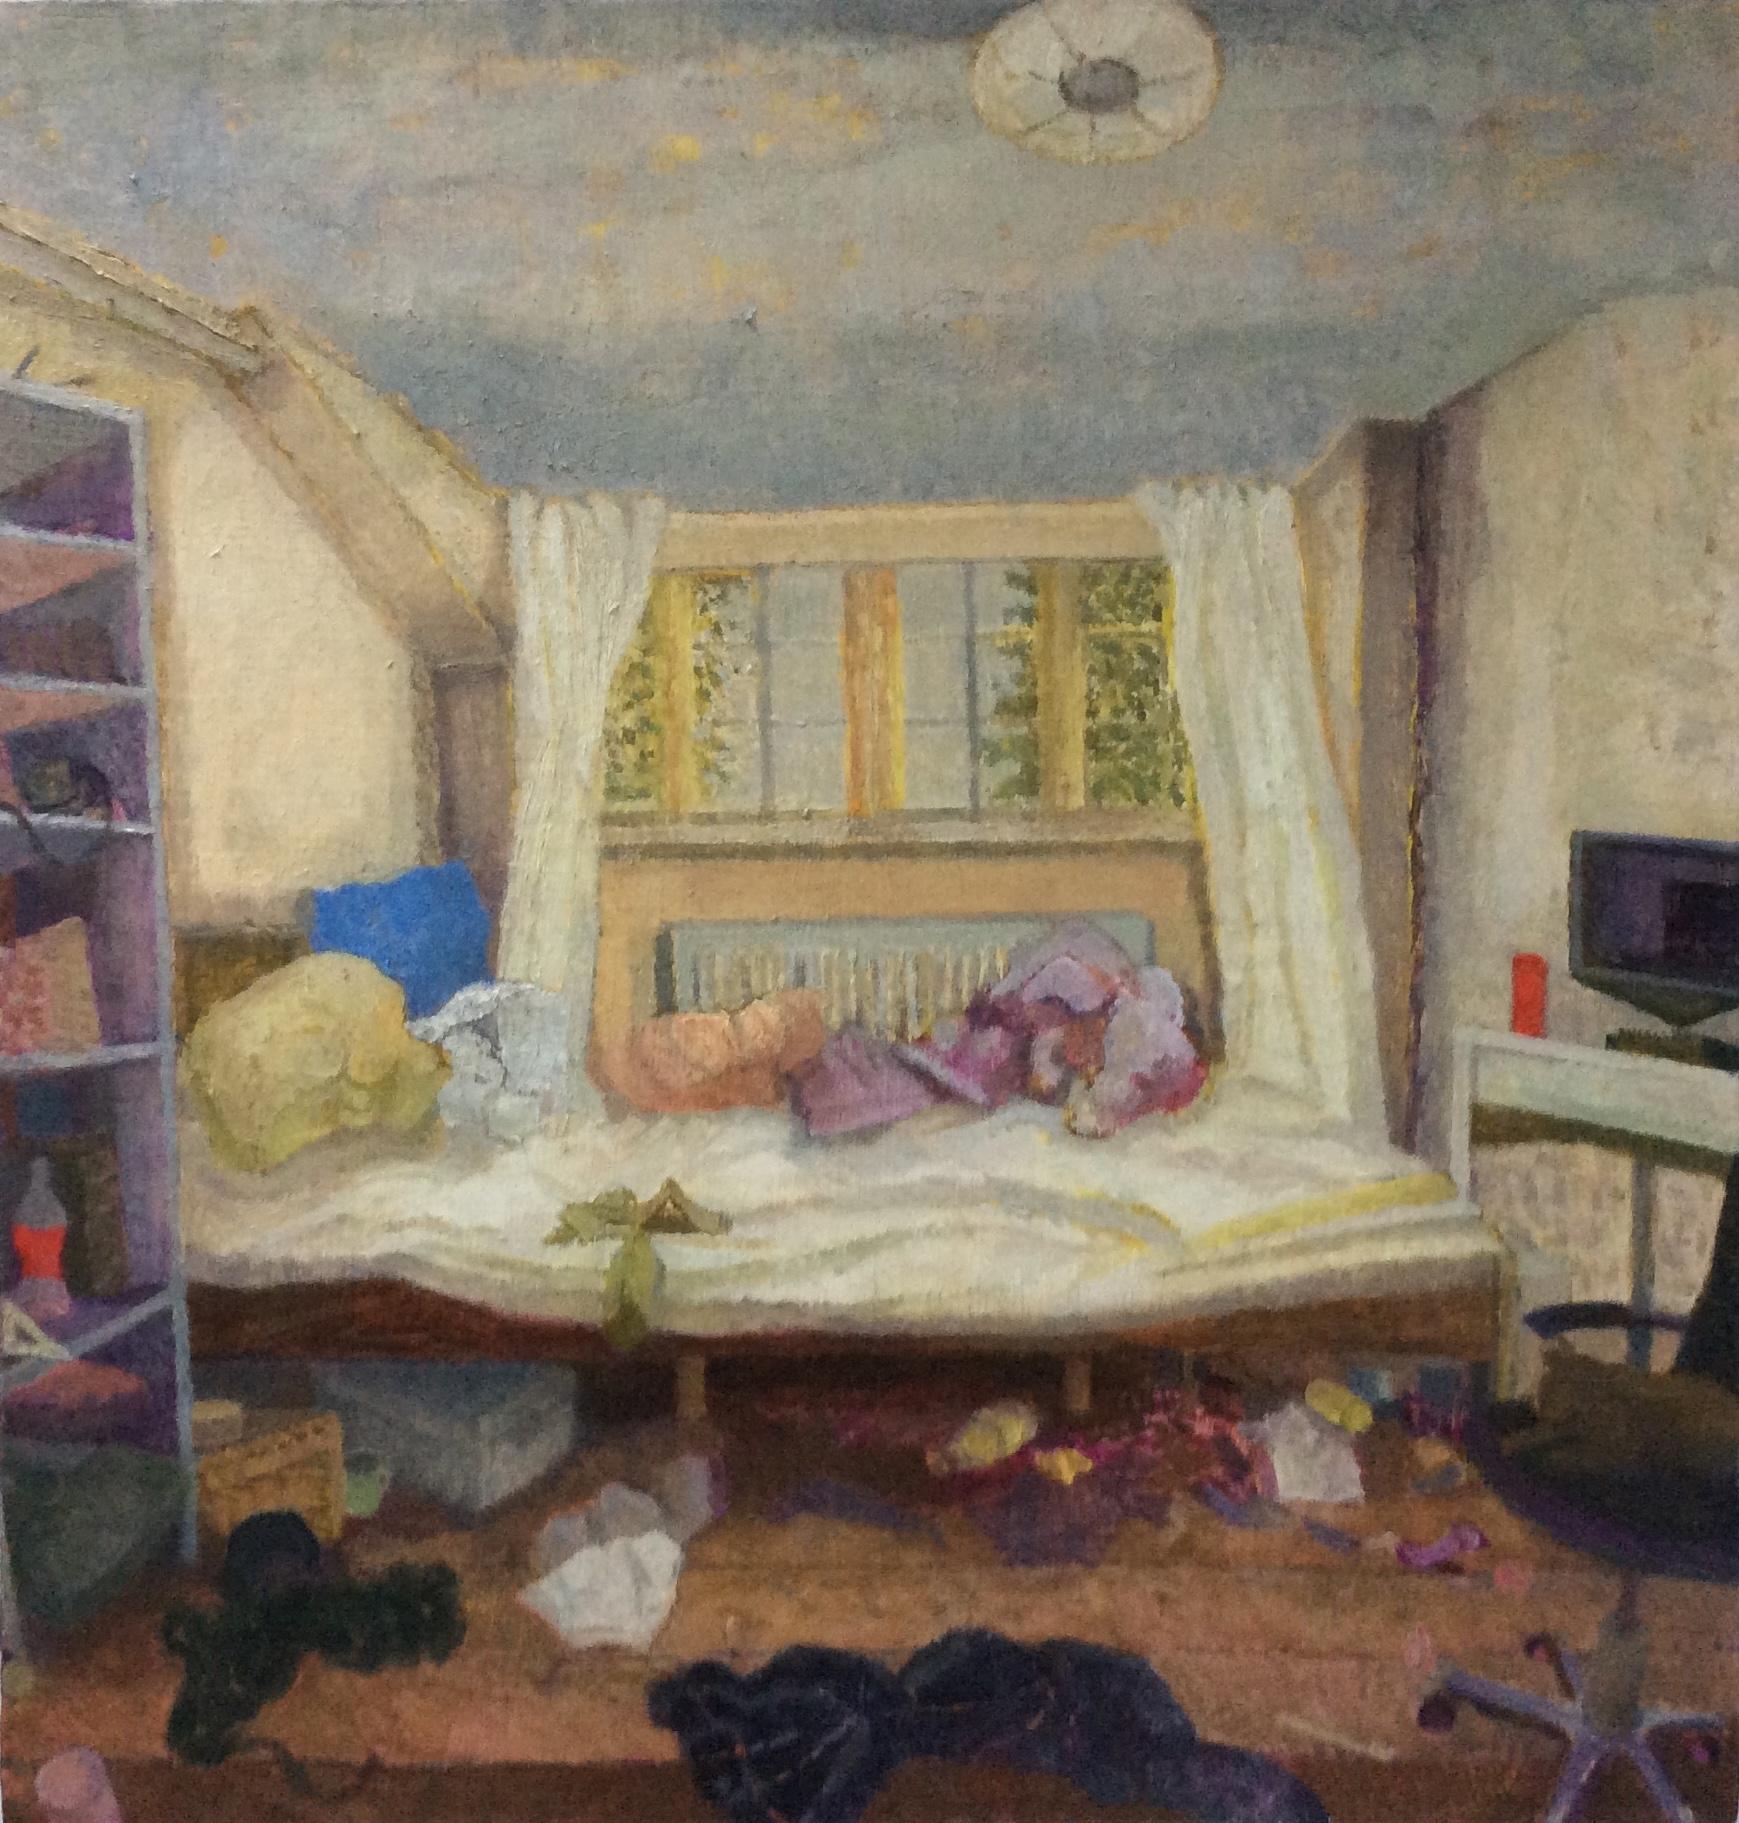 Teenage Room Anarchy 2020, oil on gesso panel